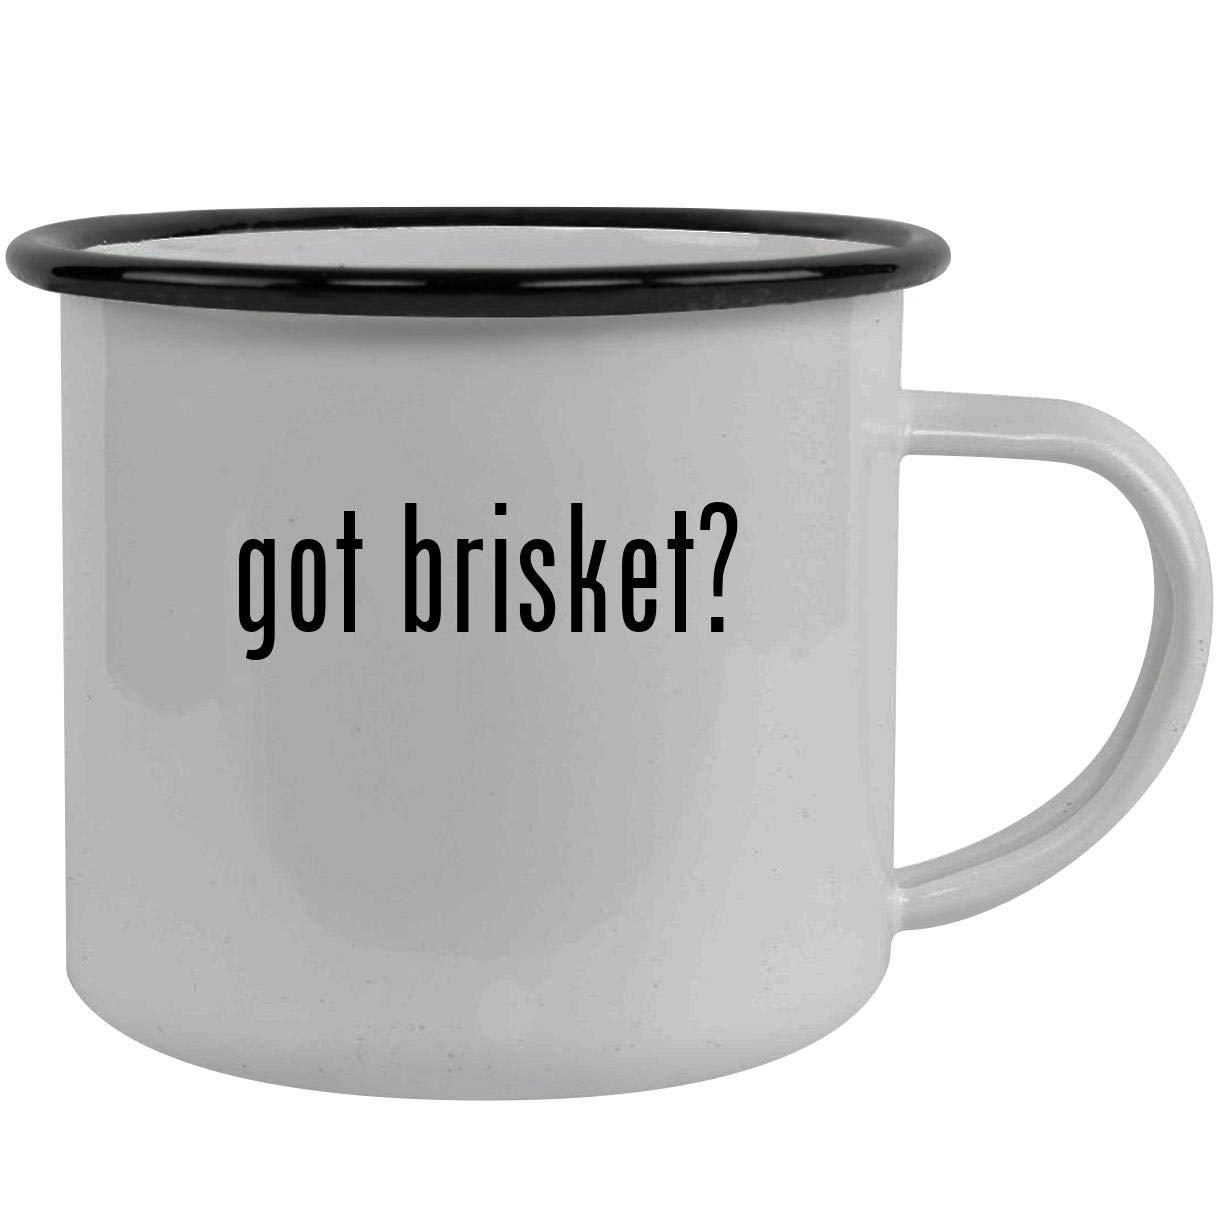 got brisket? - Stainless Steel 12oz Camping Mug, Black